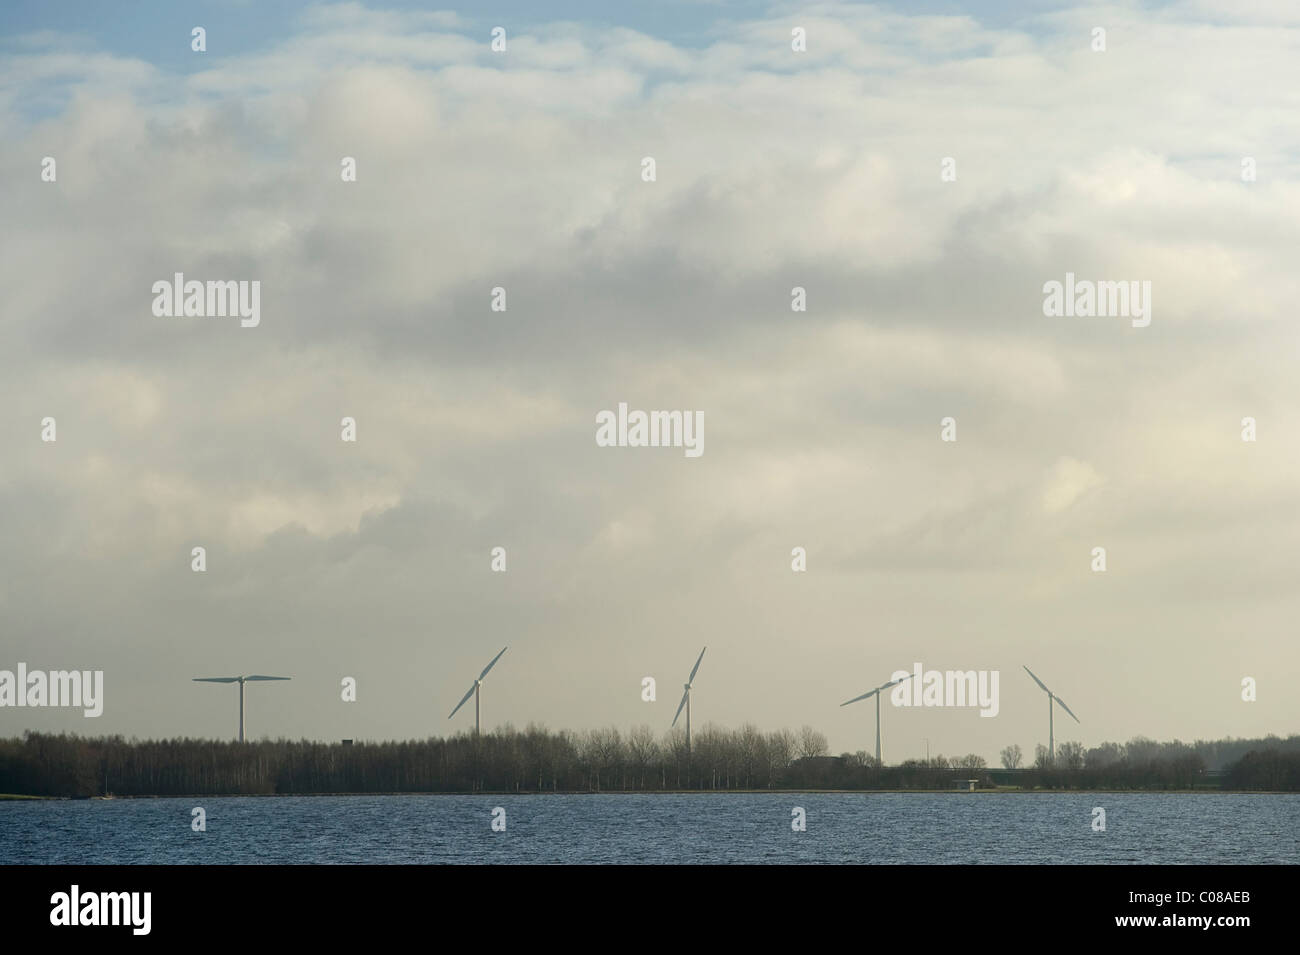 Energia di Vento in Paesi Bassi Immagini Stock